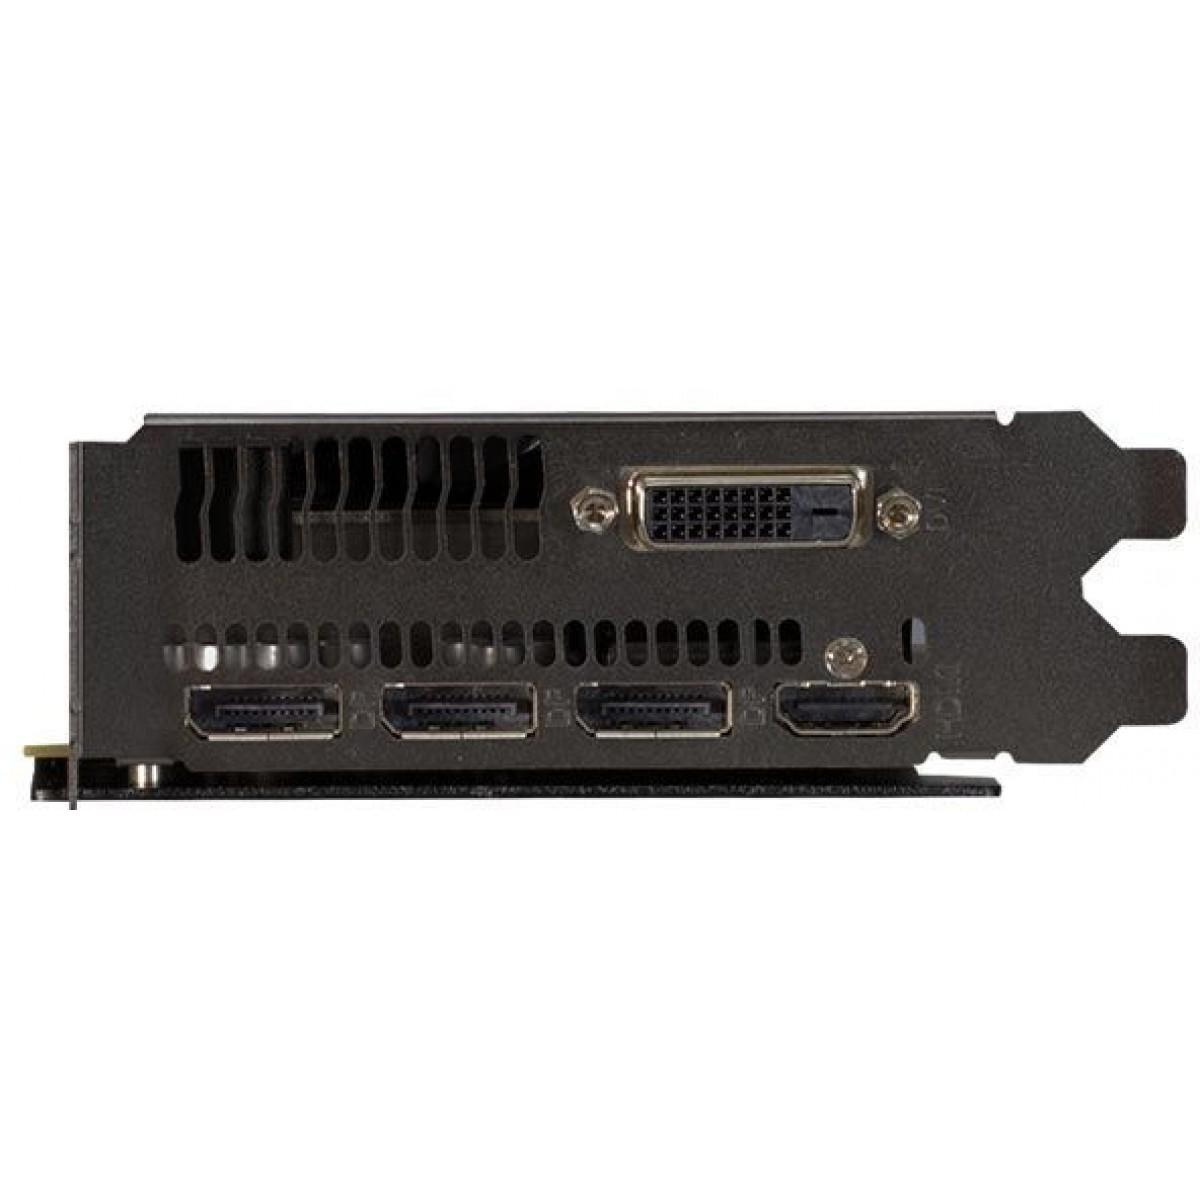 Placa de Vídeo PowerColor Radeon RX 580 Red Dragon Golden Sample, 8GB GDDR5, 256Bit